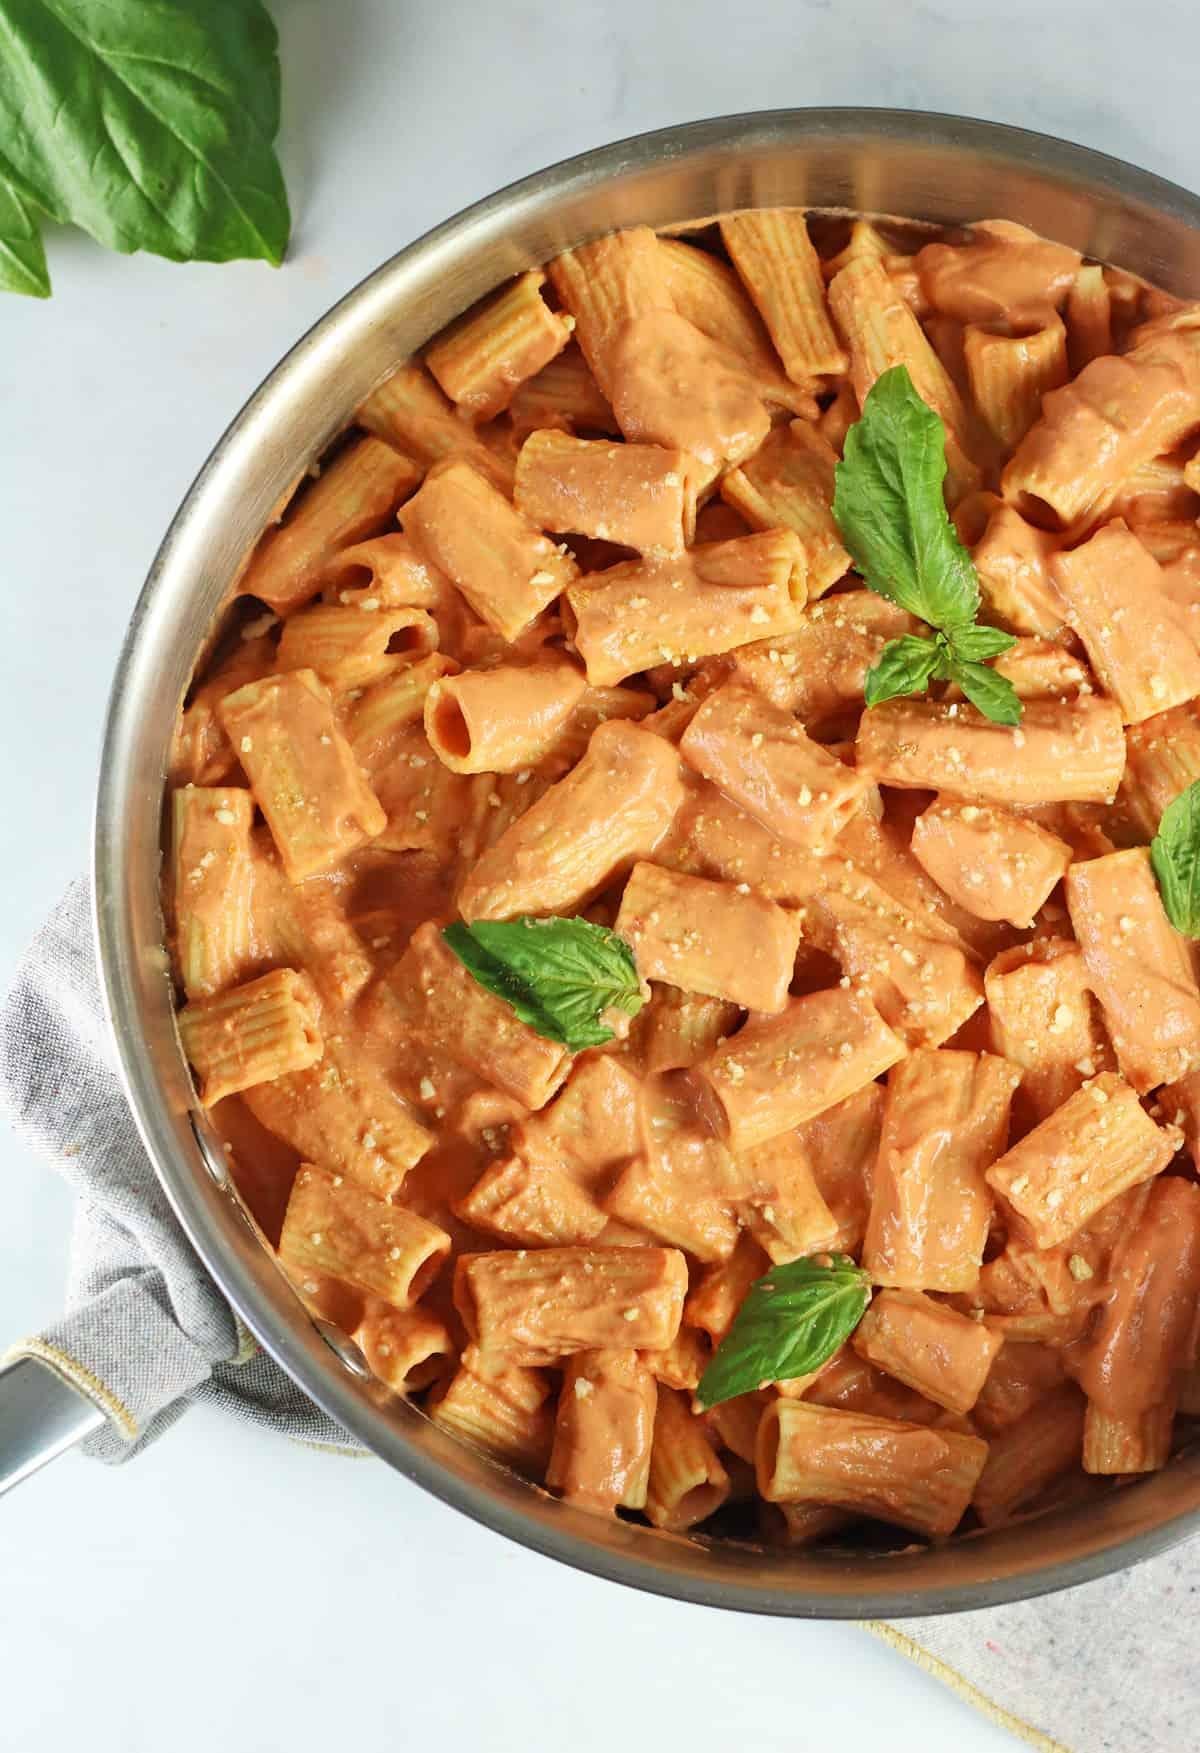 closeup of vegan vodka alla pasta in a pan with fresh basil